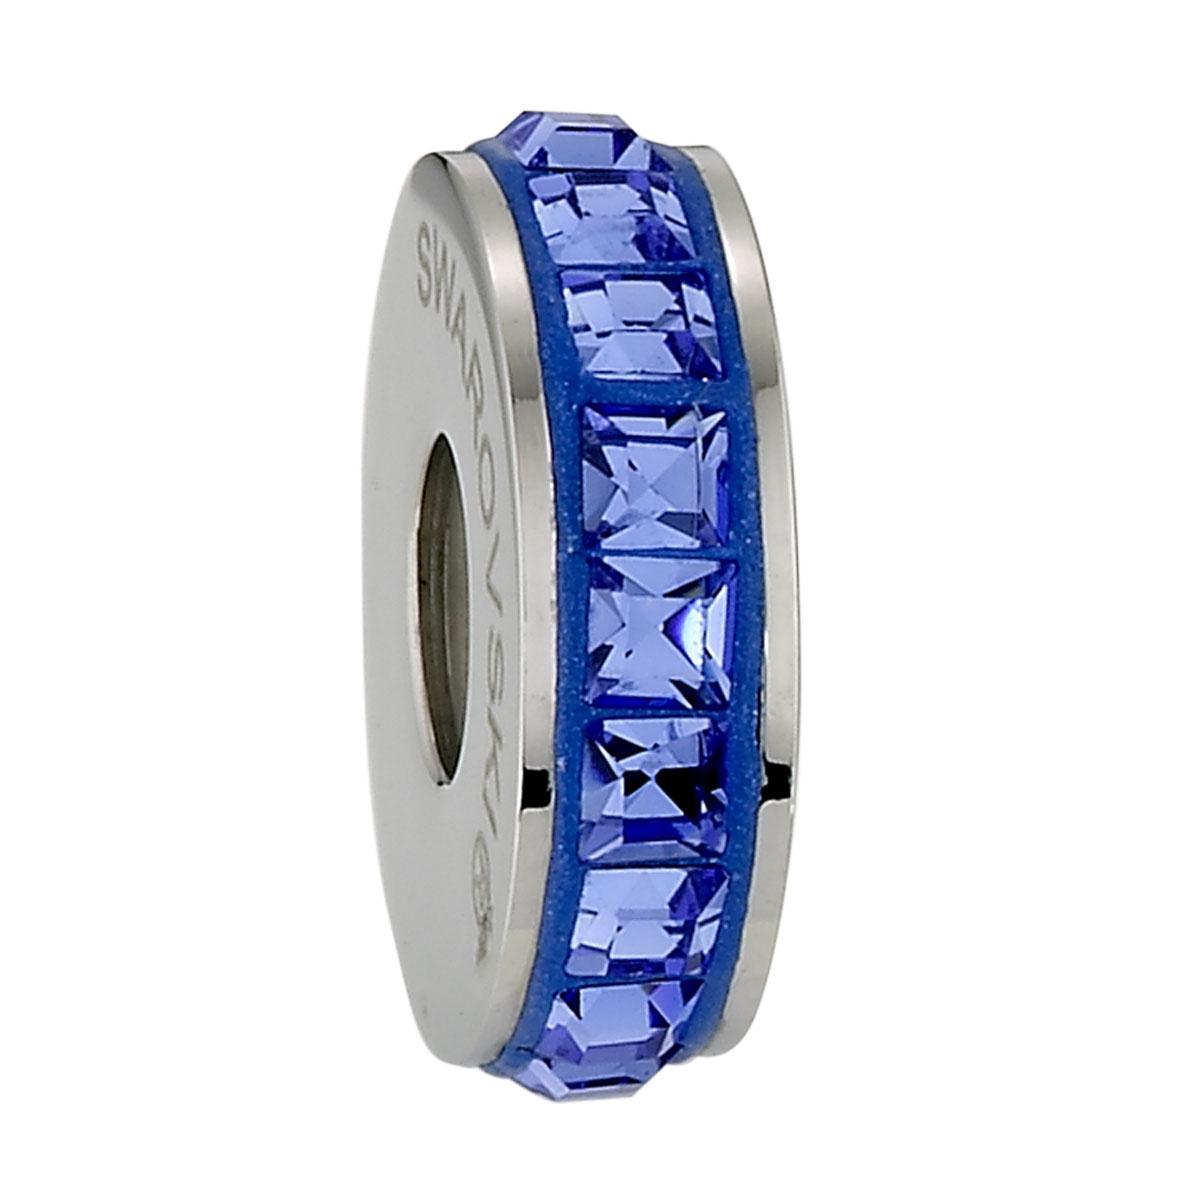 A512 施華洛世奇水晶輪子項鍊